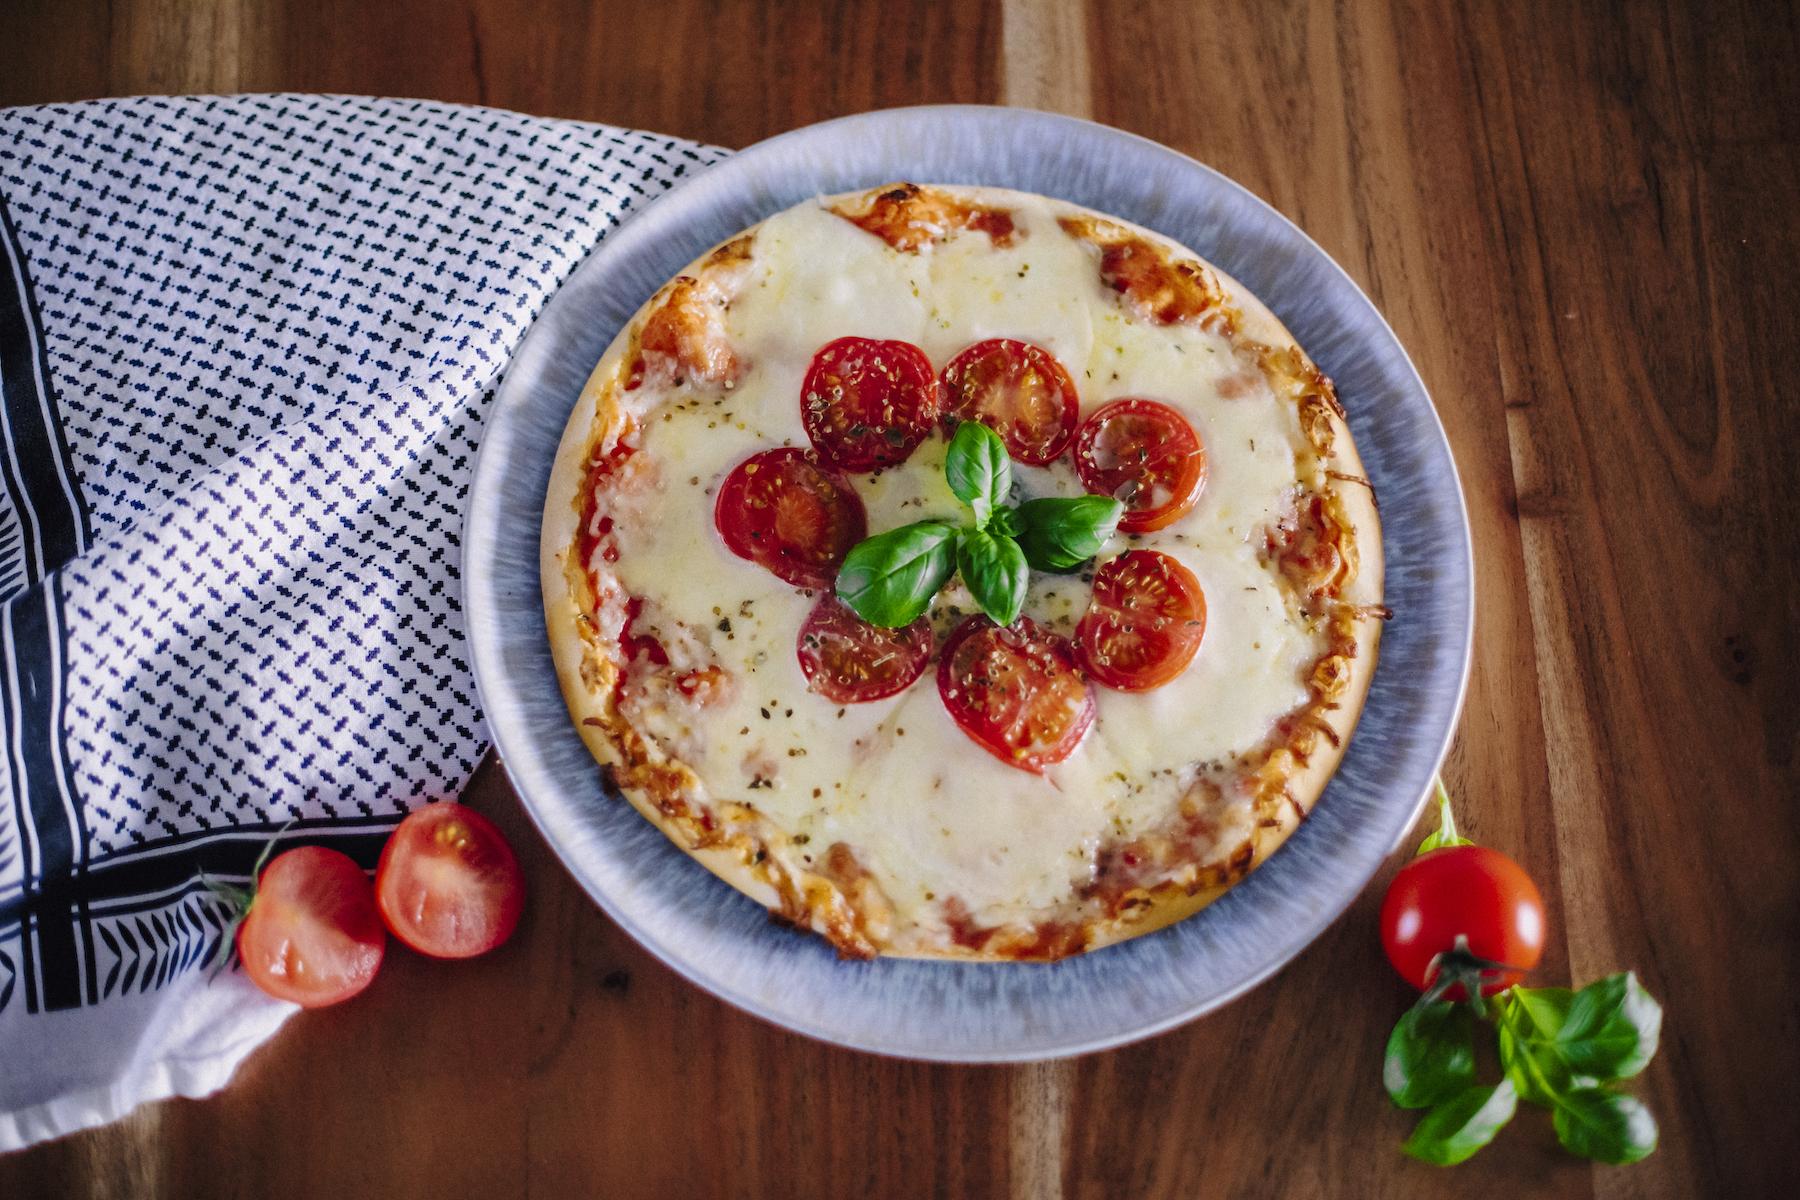 suelovesnyc_susan_fengler_glutenfreie_tiefkuhlpizza_verfeinern_glutenfreie_tiefkuehlpizza_verfeinern_pimp_my_pizza_new_york_pizza